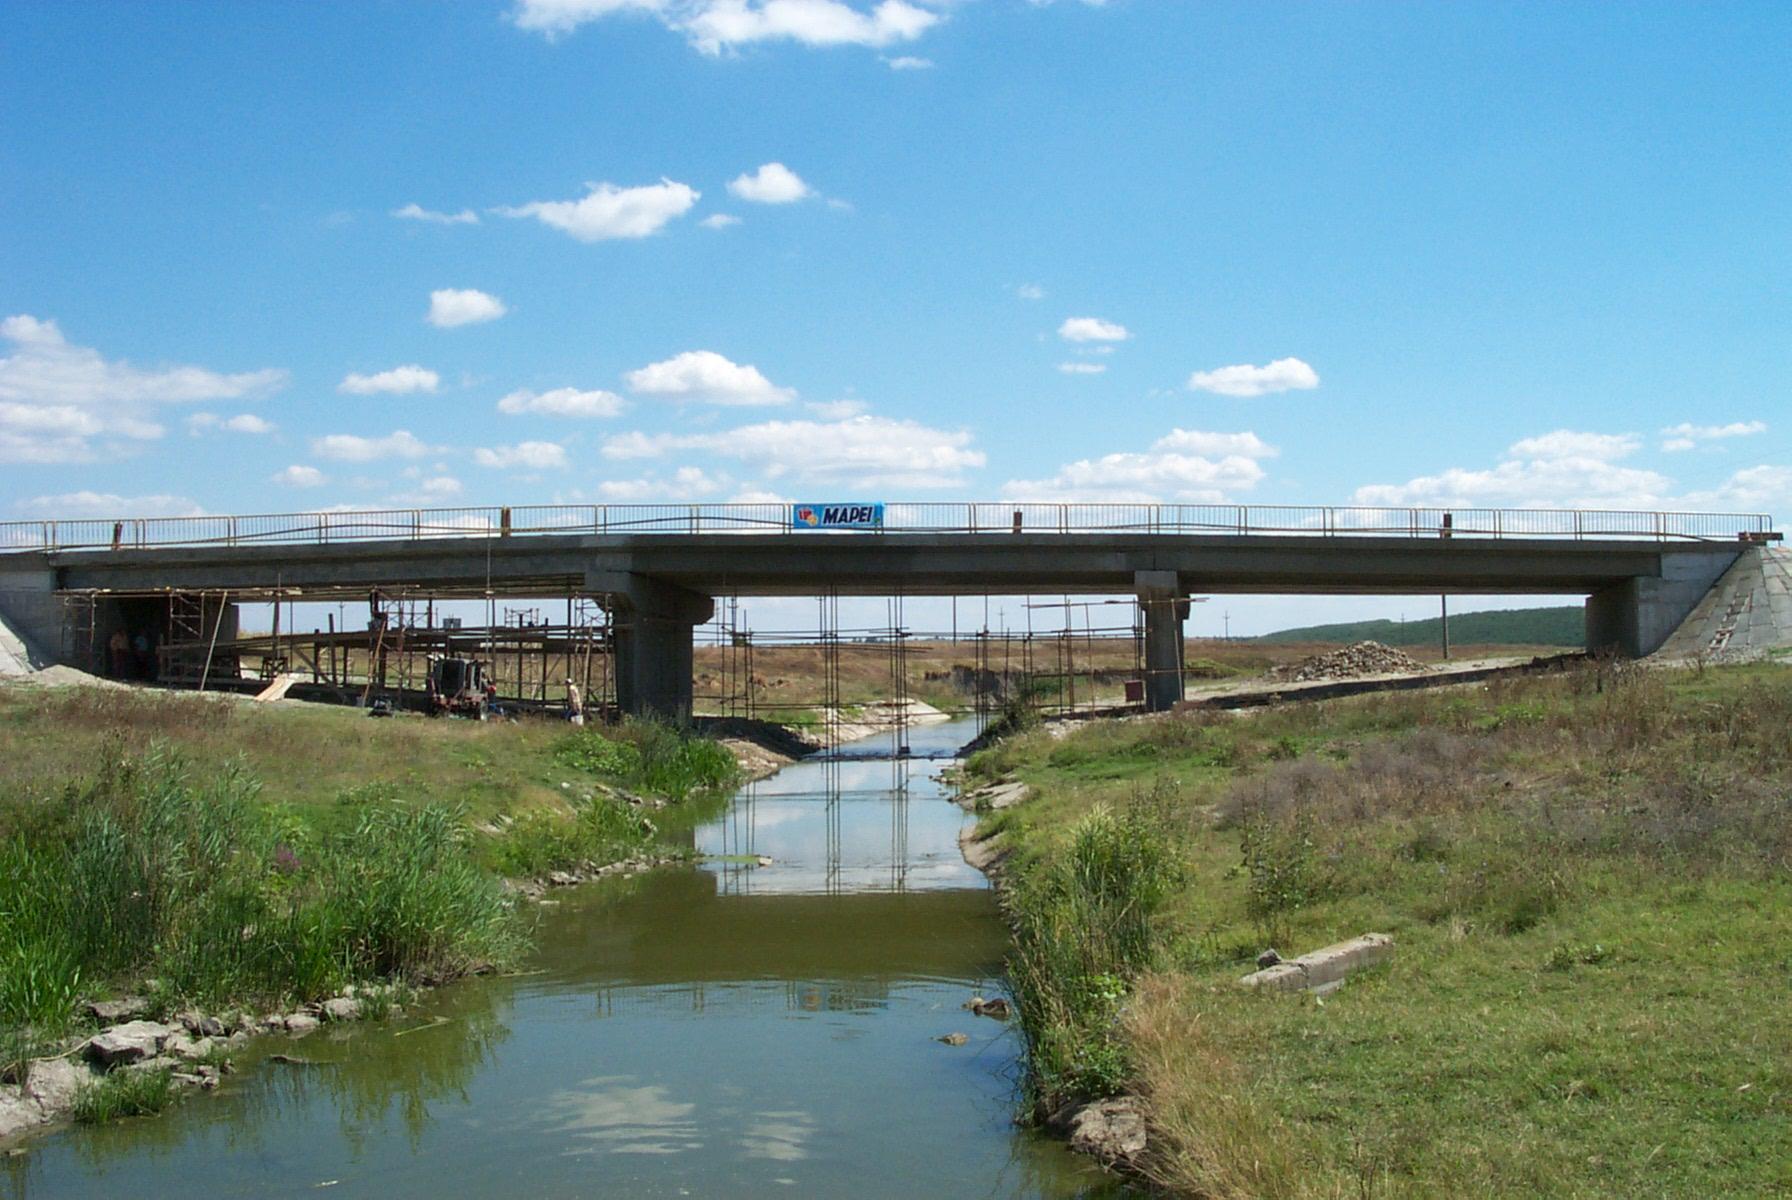 Reparatii pod (DN2), Km. 33 - 028, peste raul Calnistea MAPEI - Poza 2